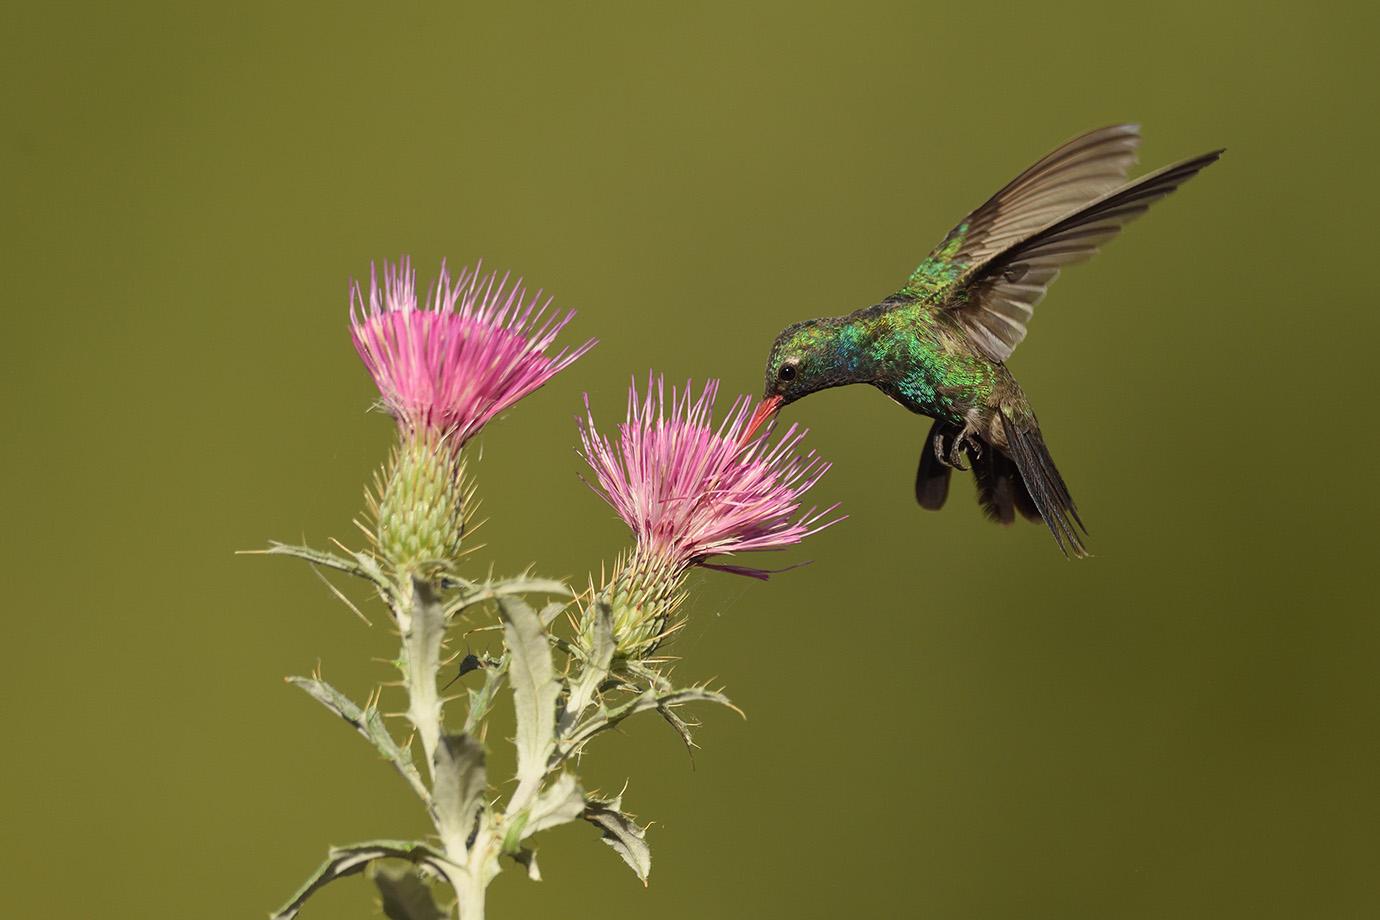 Copy of Broad-billed Hummingbird © John Crawley